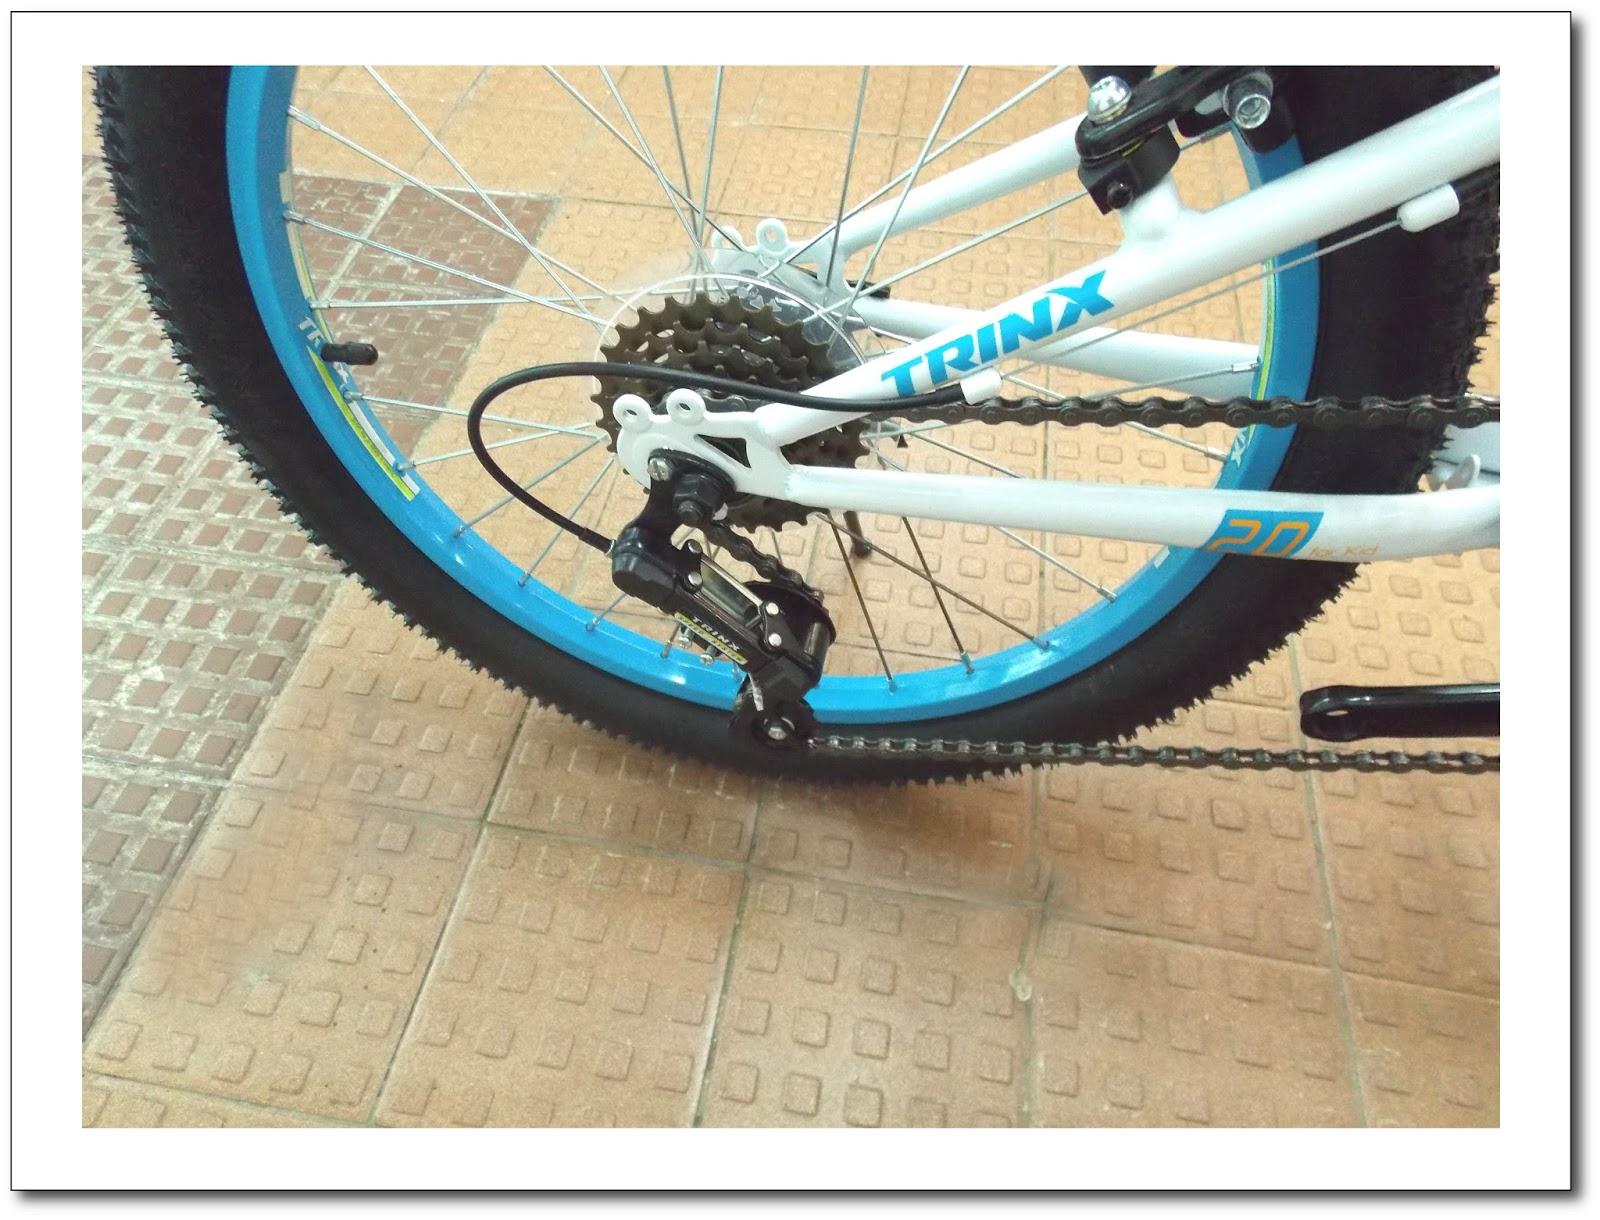 Beverly Cycle 富康單車: 將軍澳富康單車(景林邨) - Trinx Junior 1.0 20